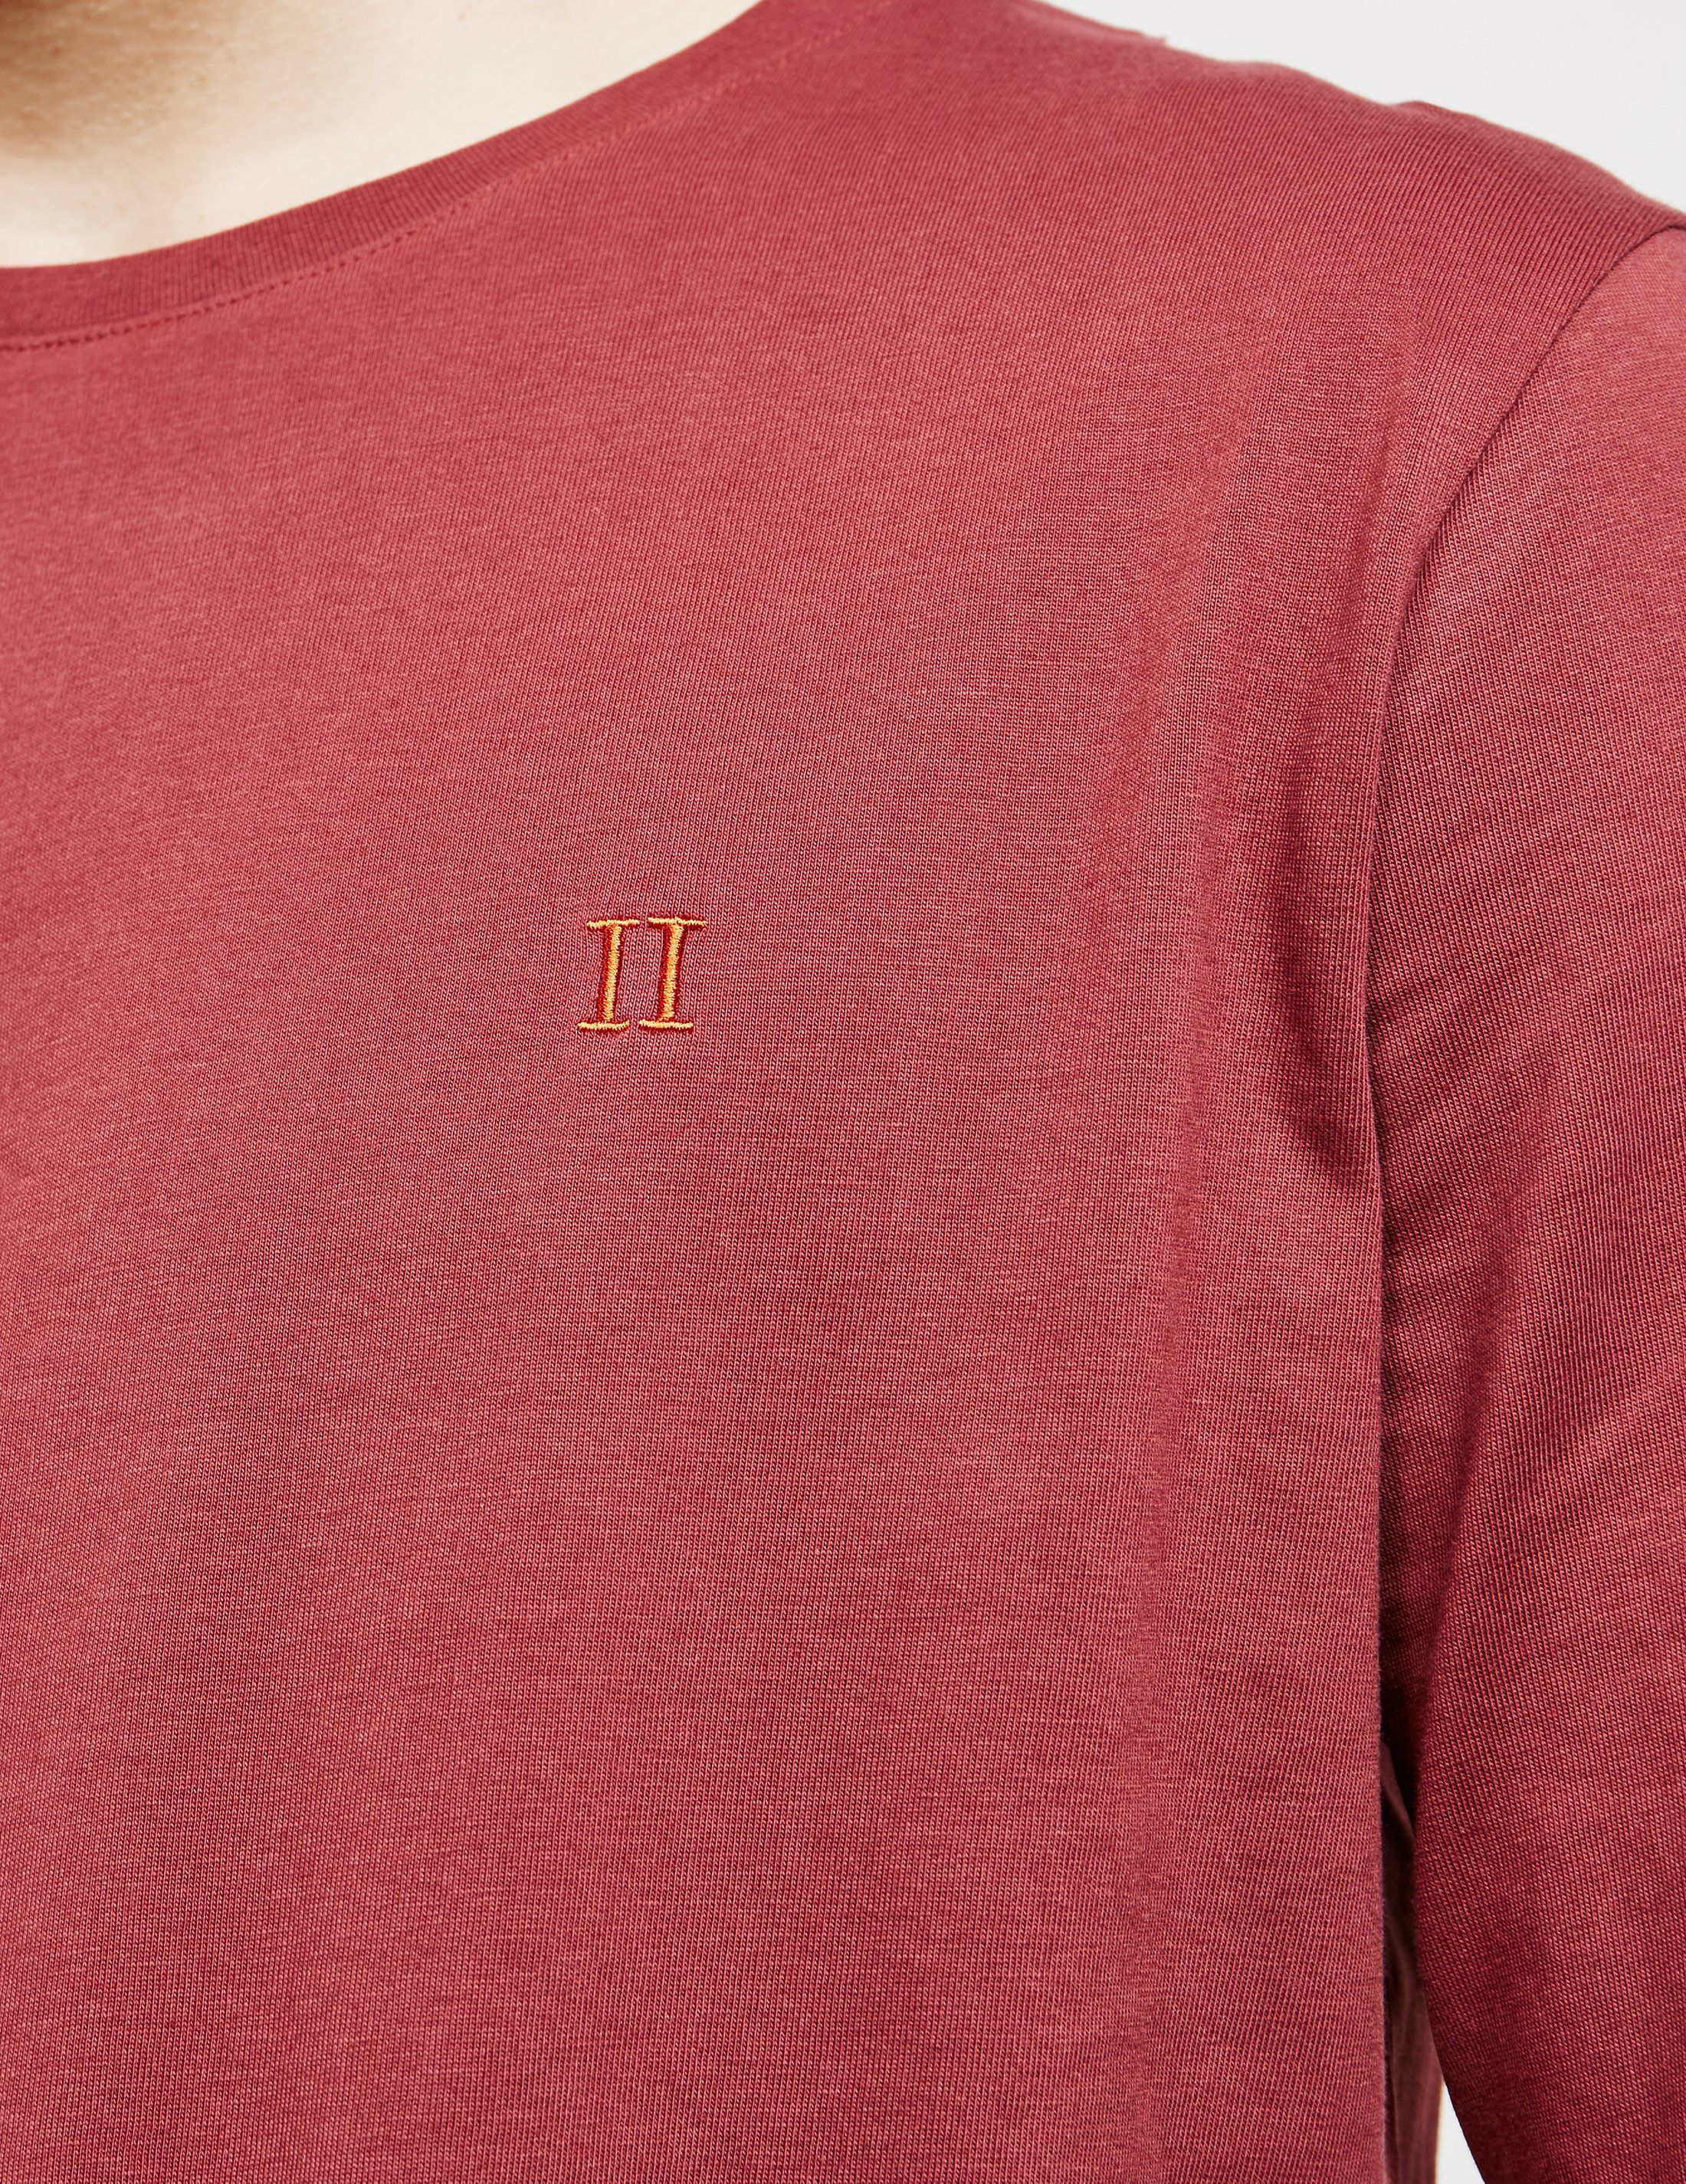 Les Deux Norgaard Long Sleeve T-Shirt